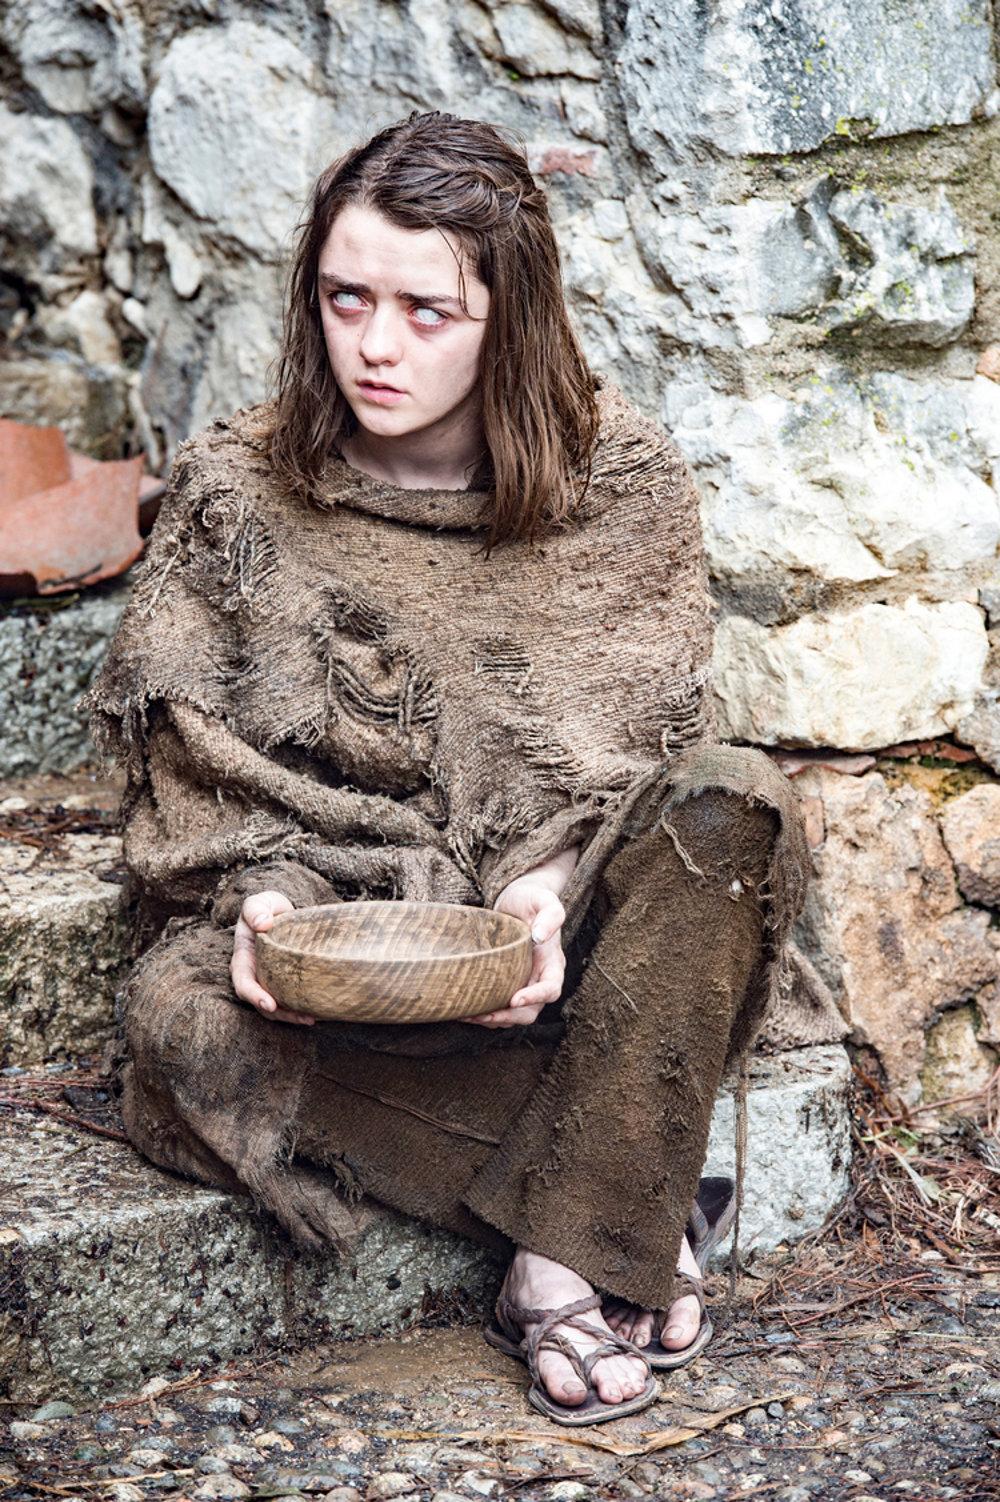 Maise Williams ako Arya Stark. Bude slepá?